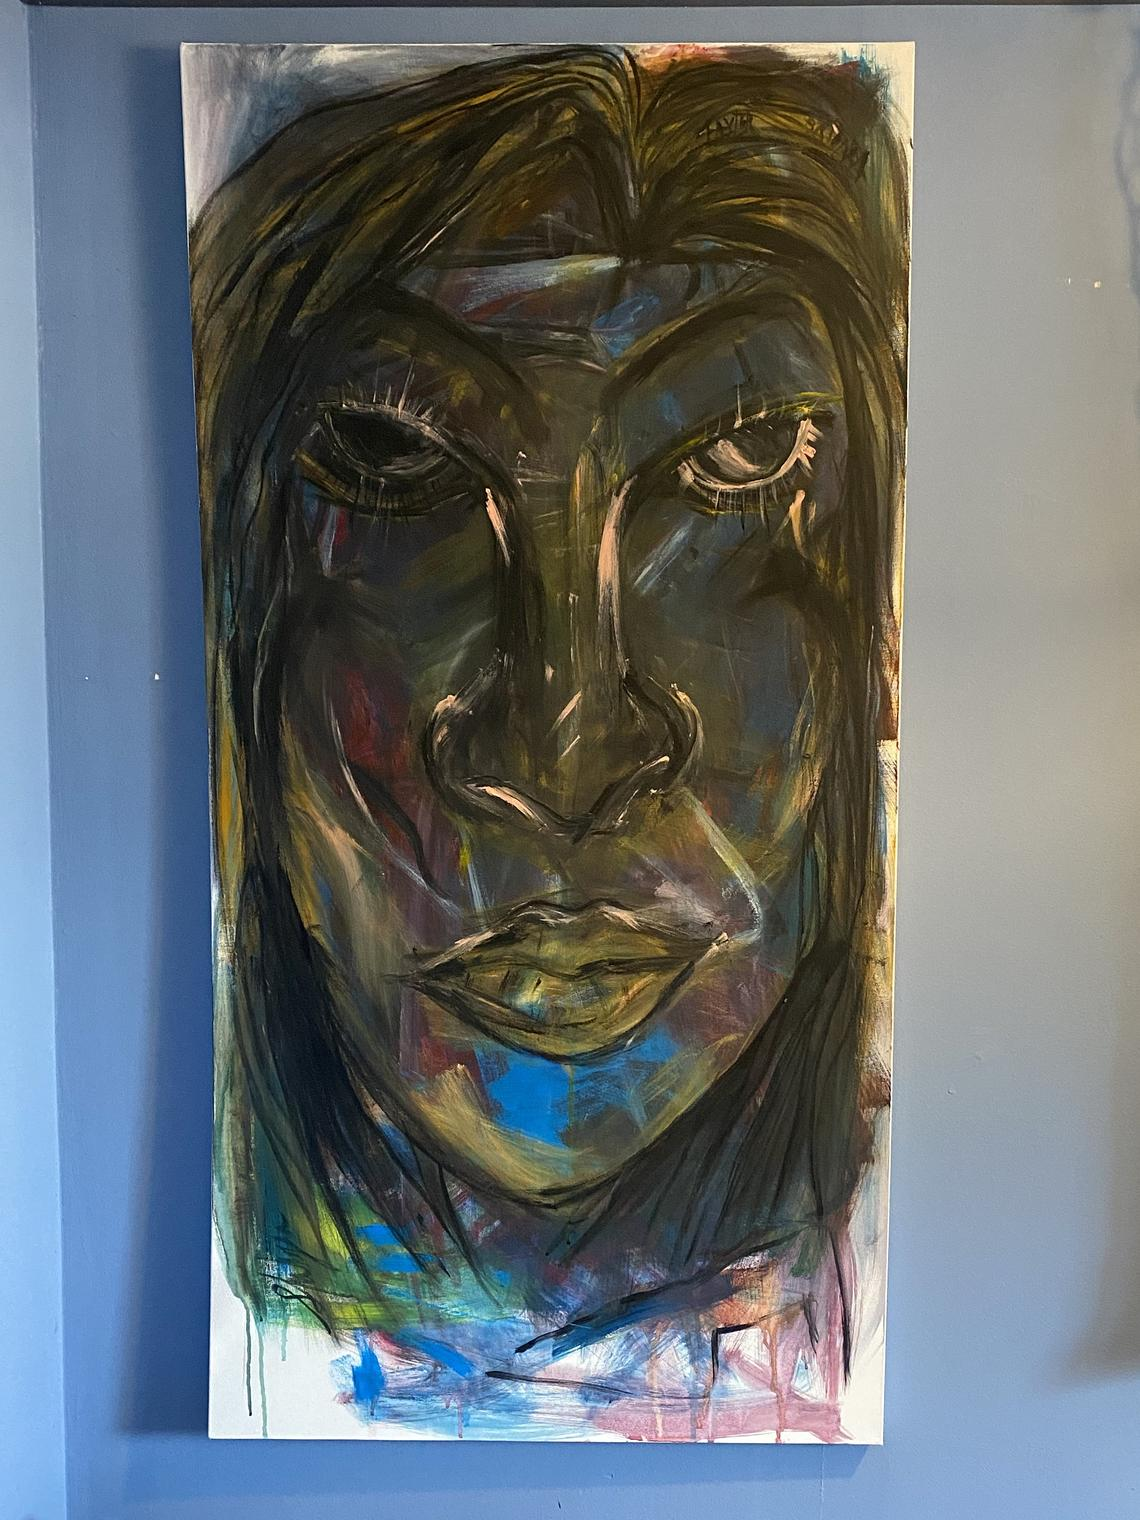 Shantana - Painting by Shakyra Sanders